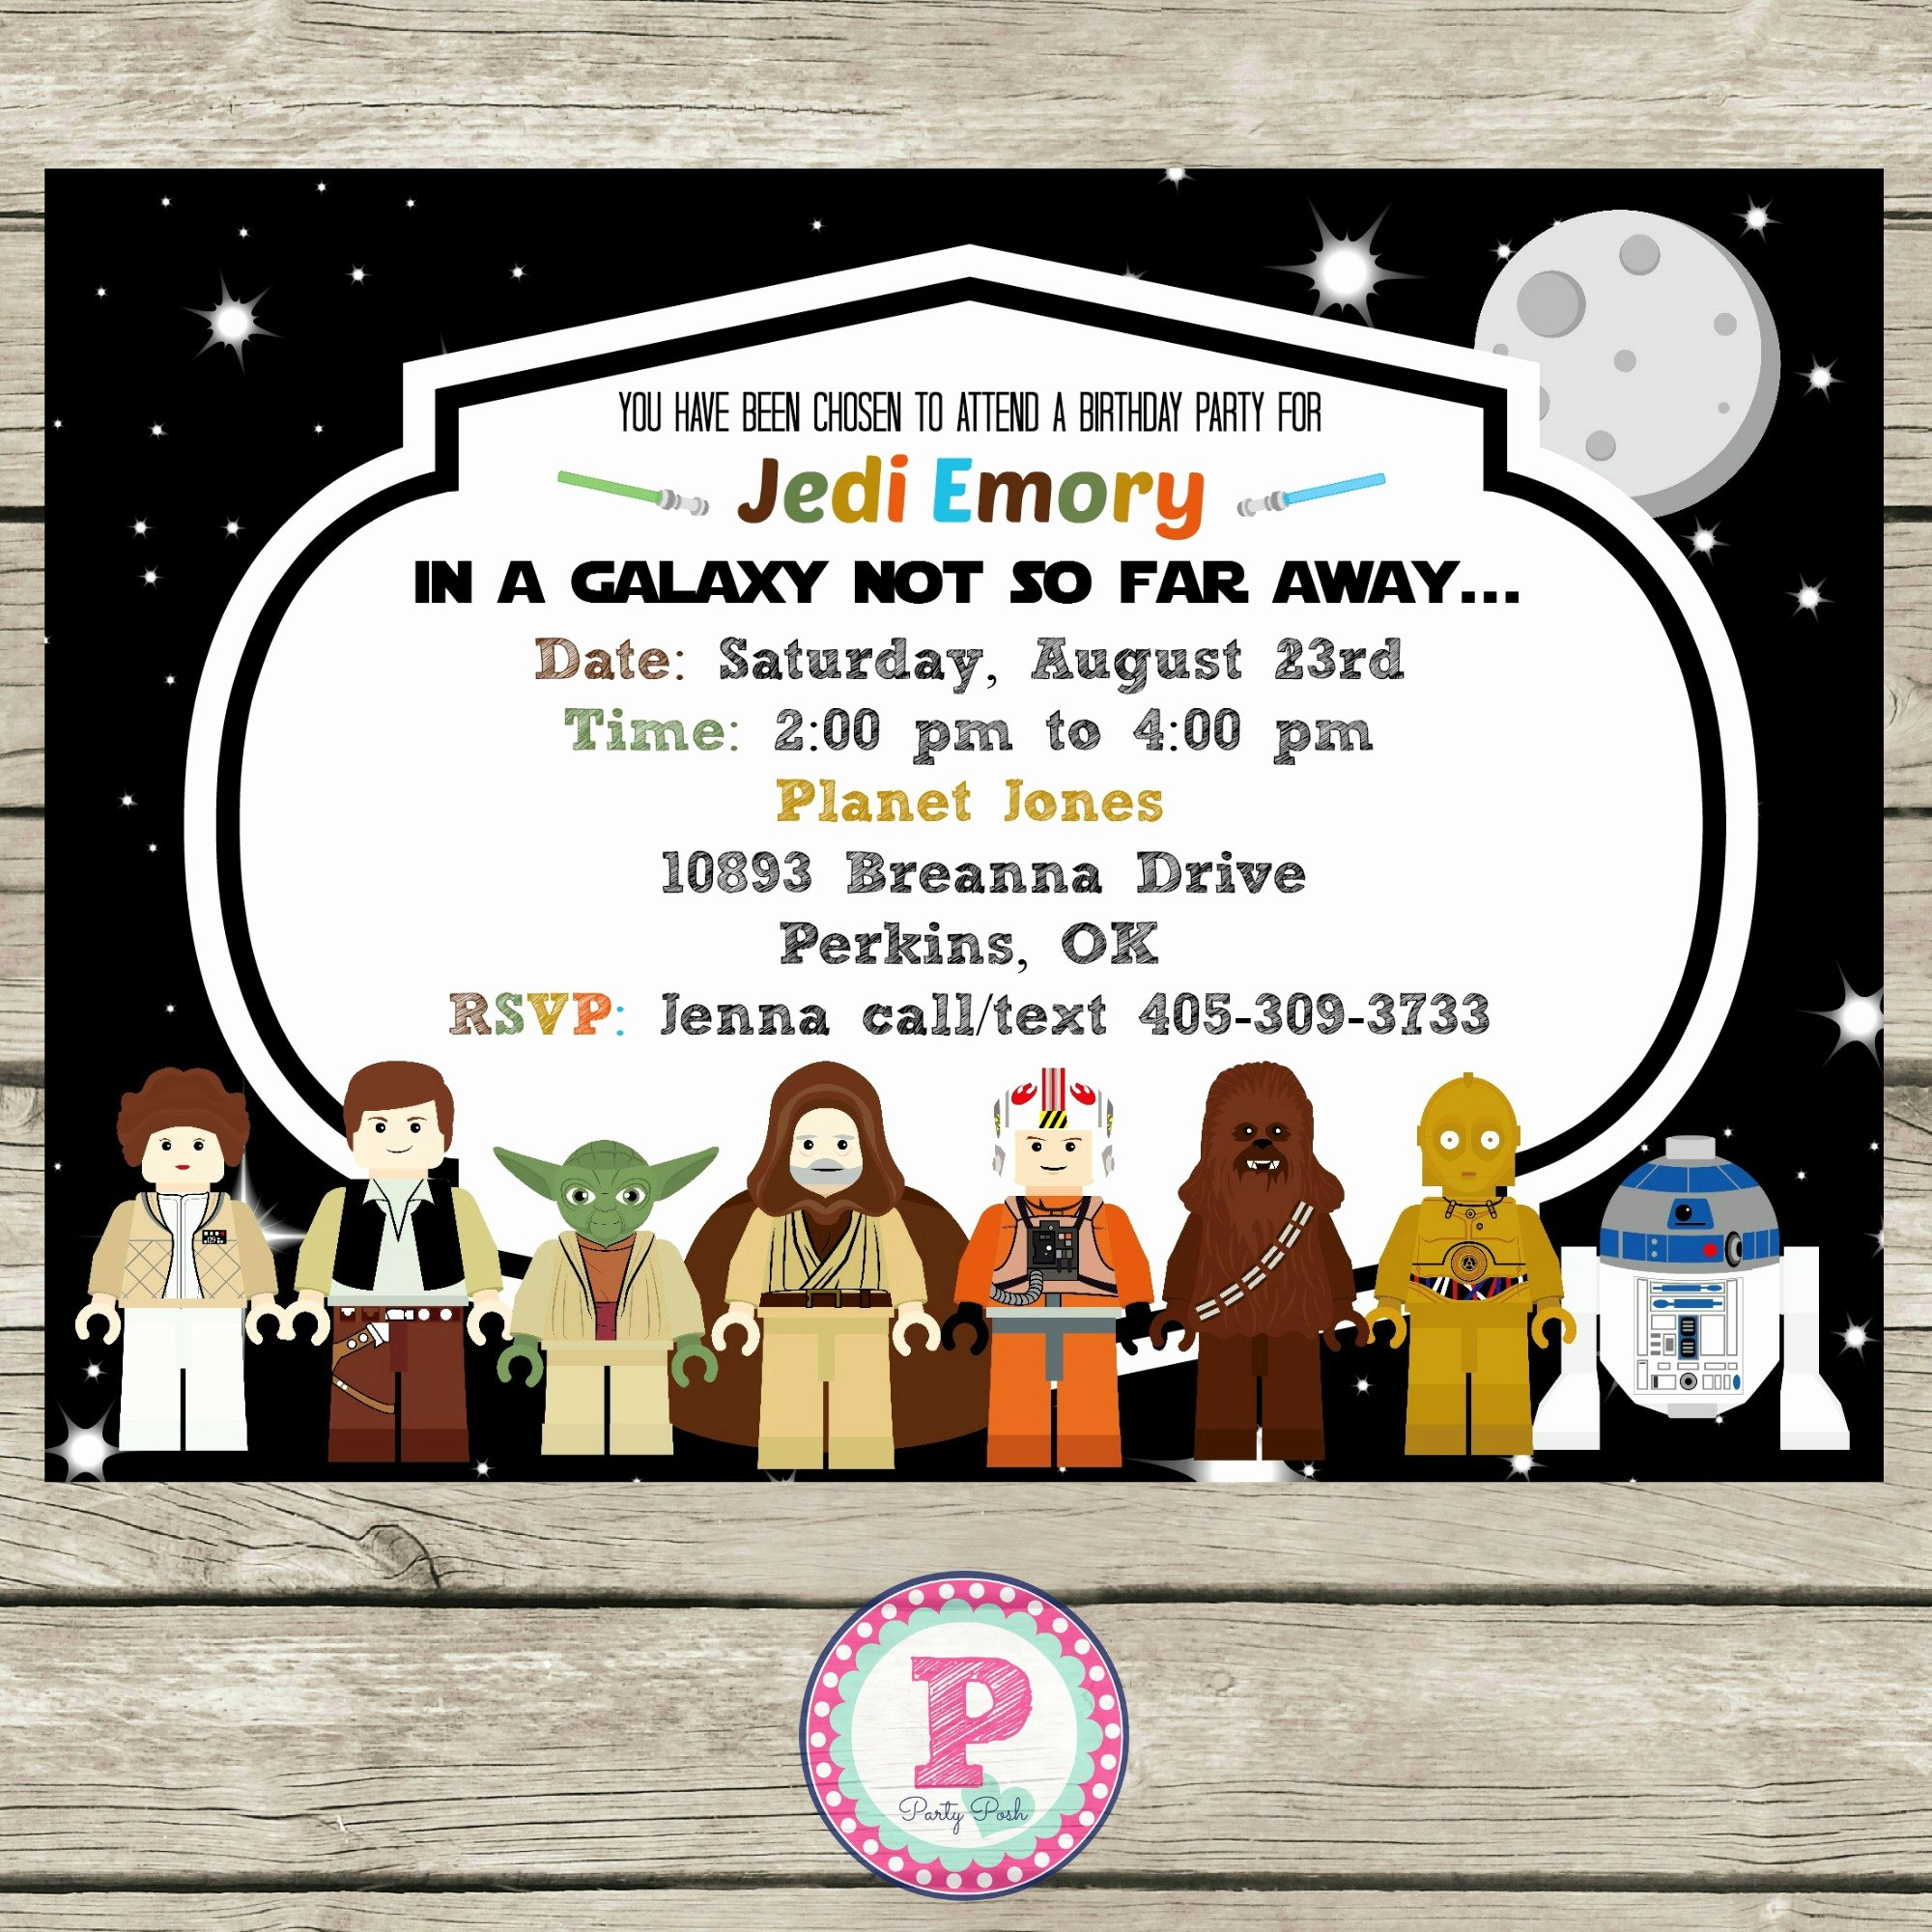 Lego Star Wars Invitations Lovely Star Wars Lego Birthday Party Ideas Invitations